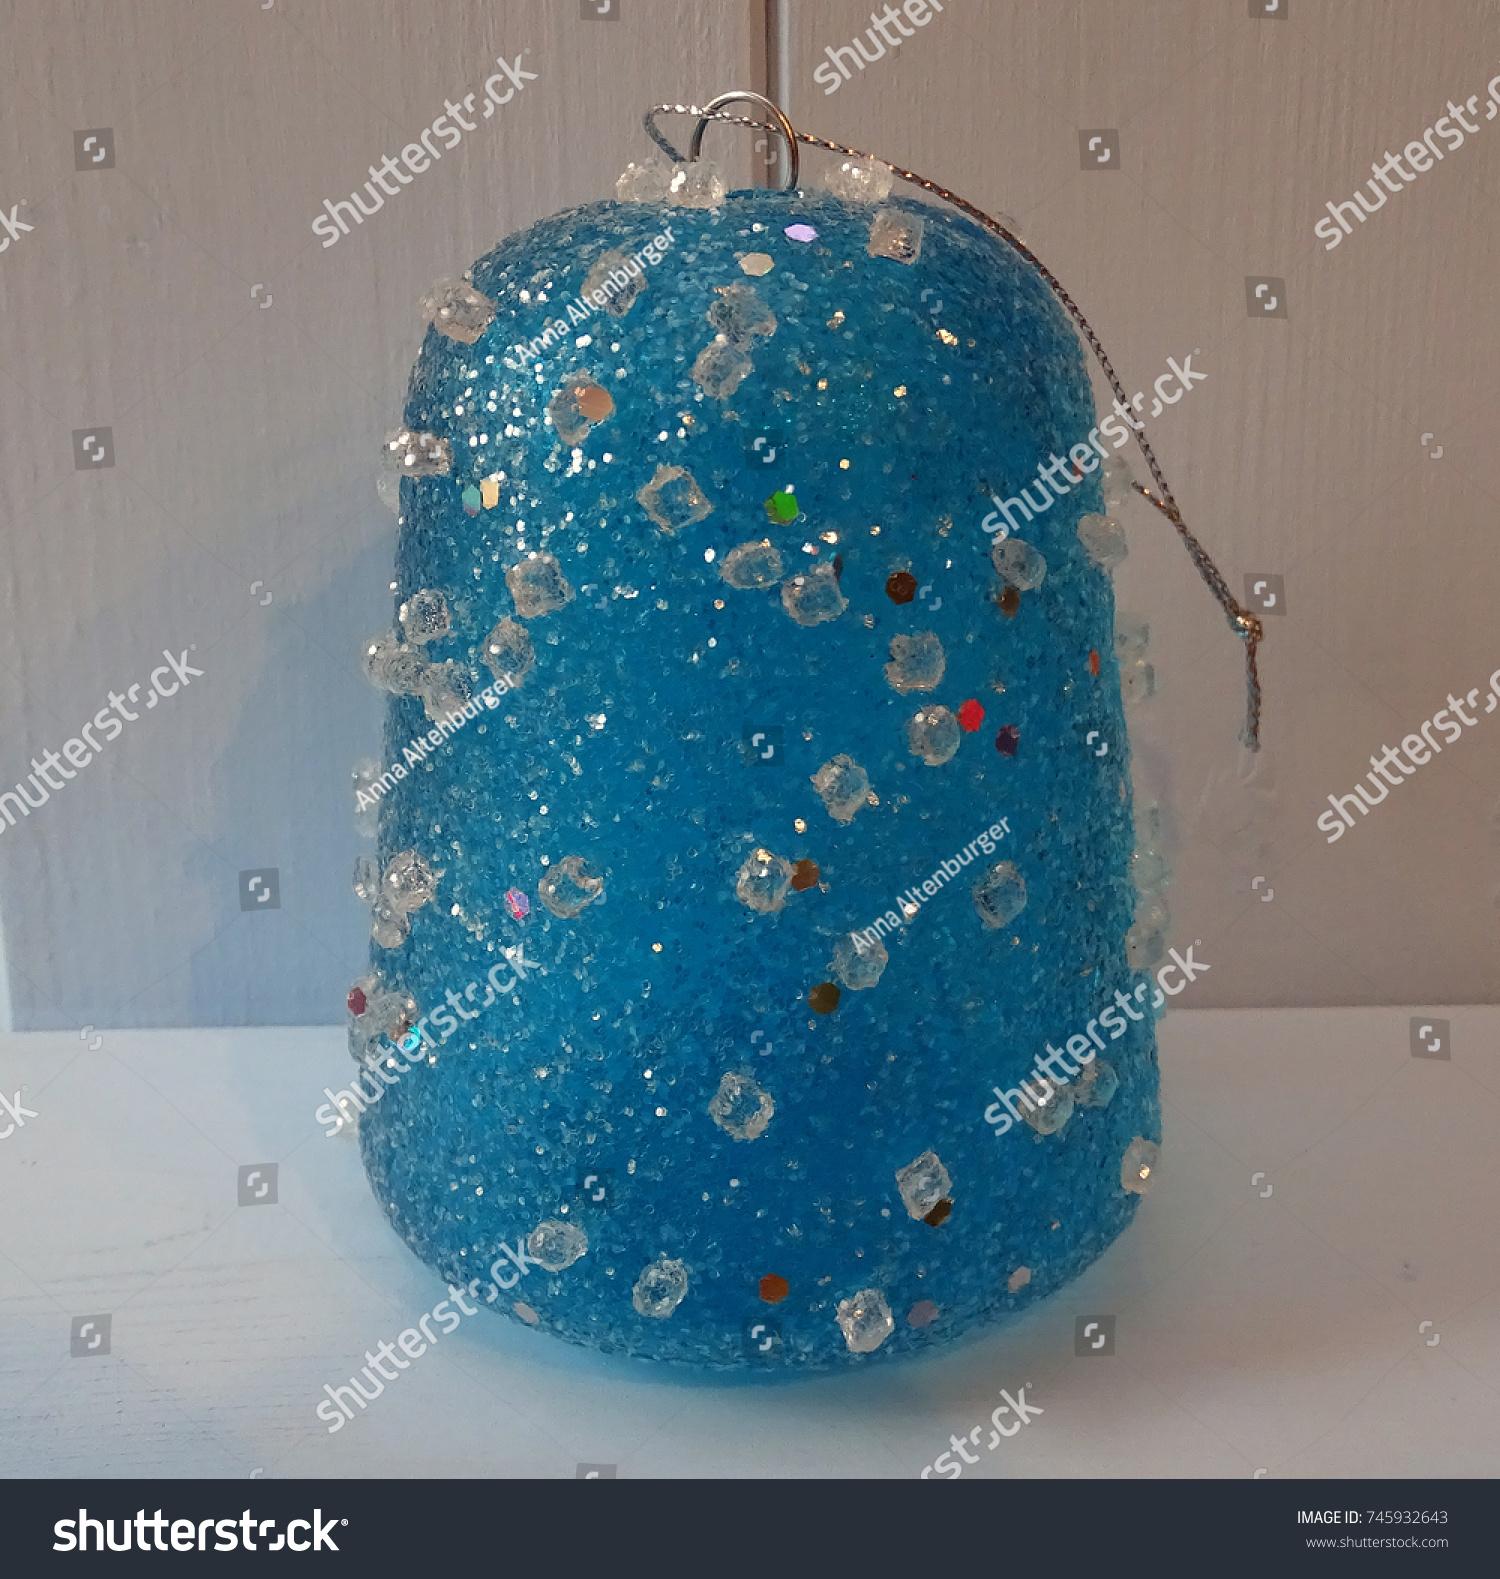 Blue Gumdrop Christmas Ornament